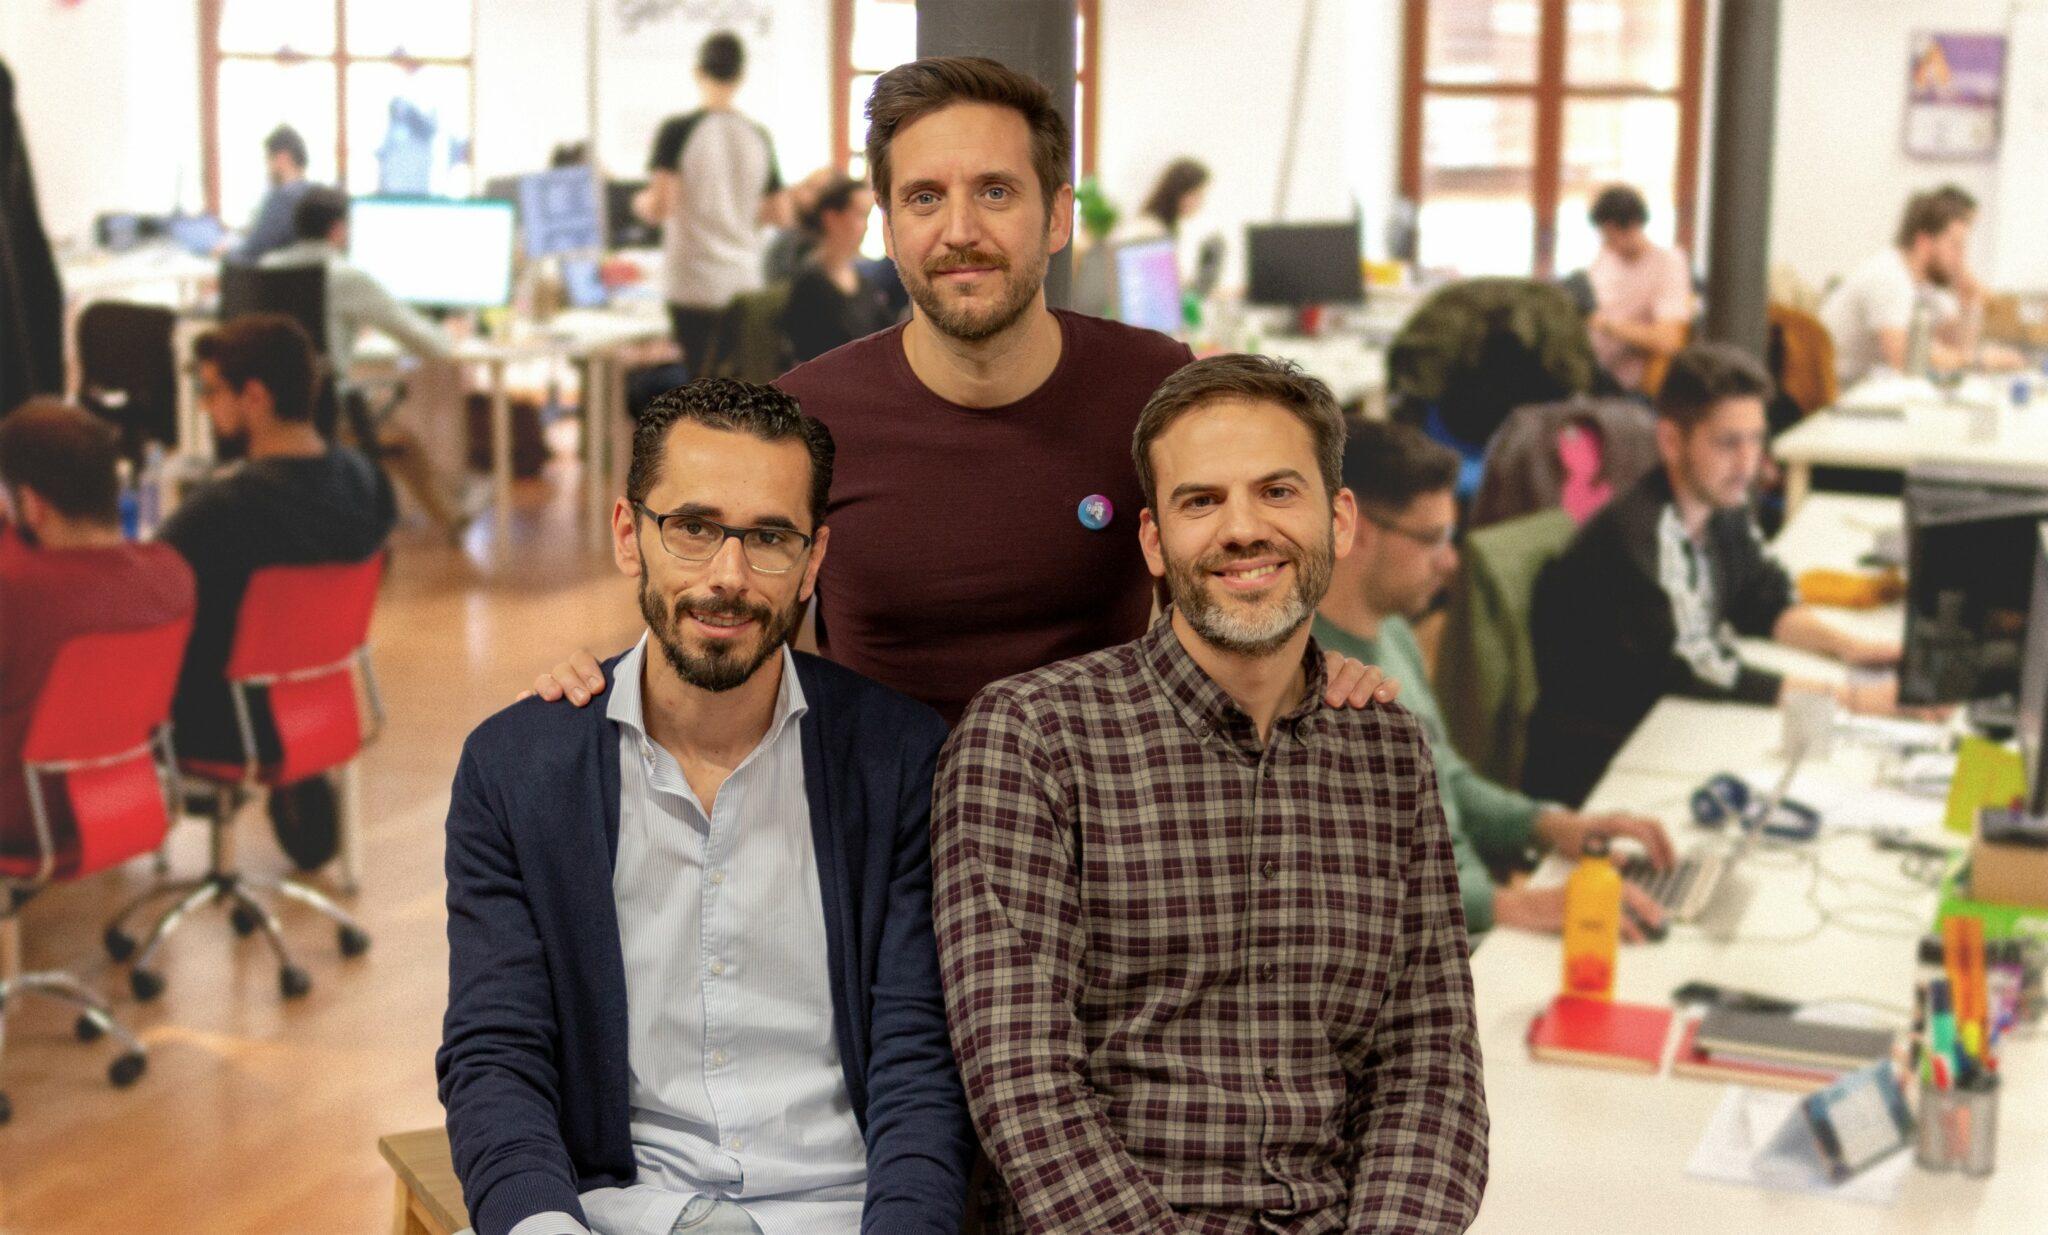 Cordoba-based Genially raises €17 million to make interactive content a global standard